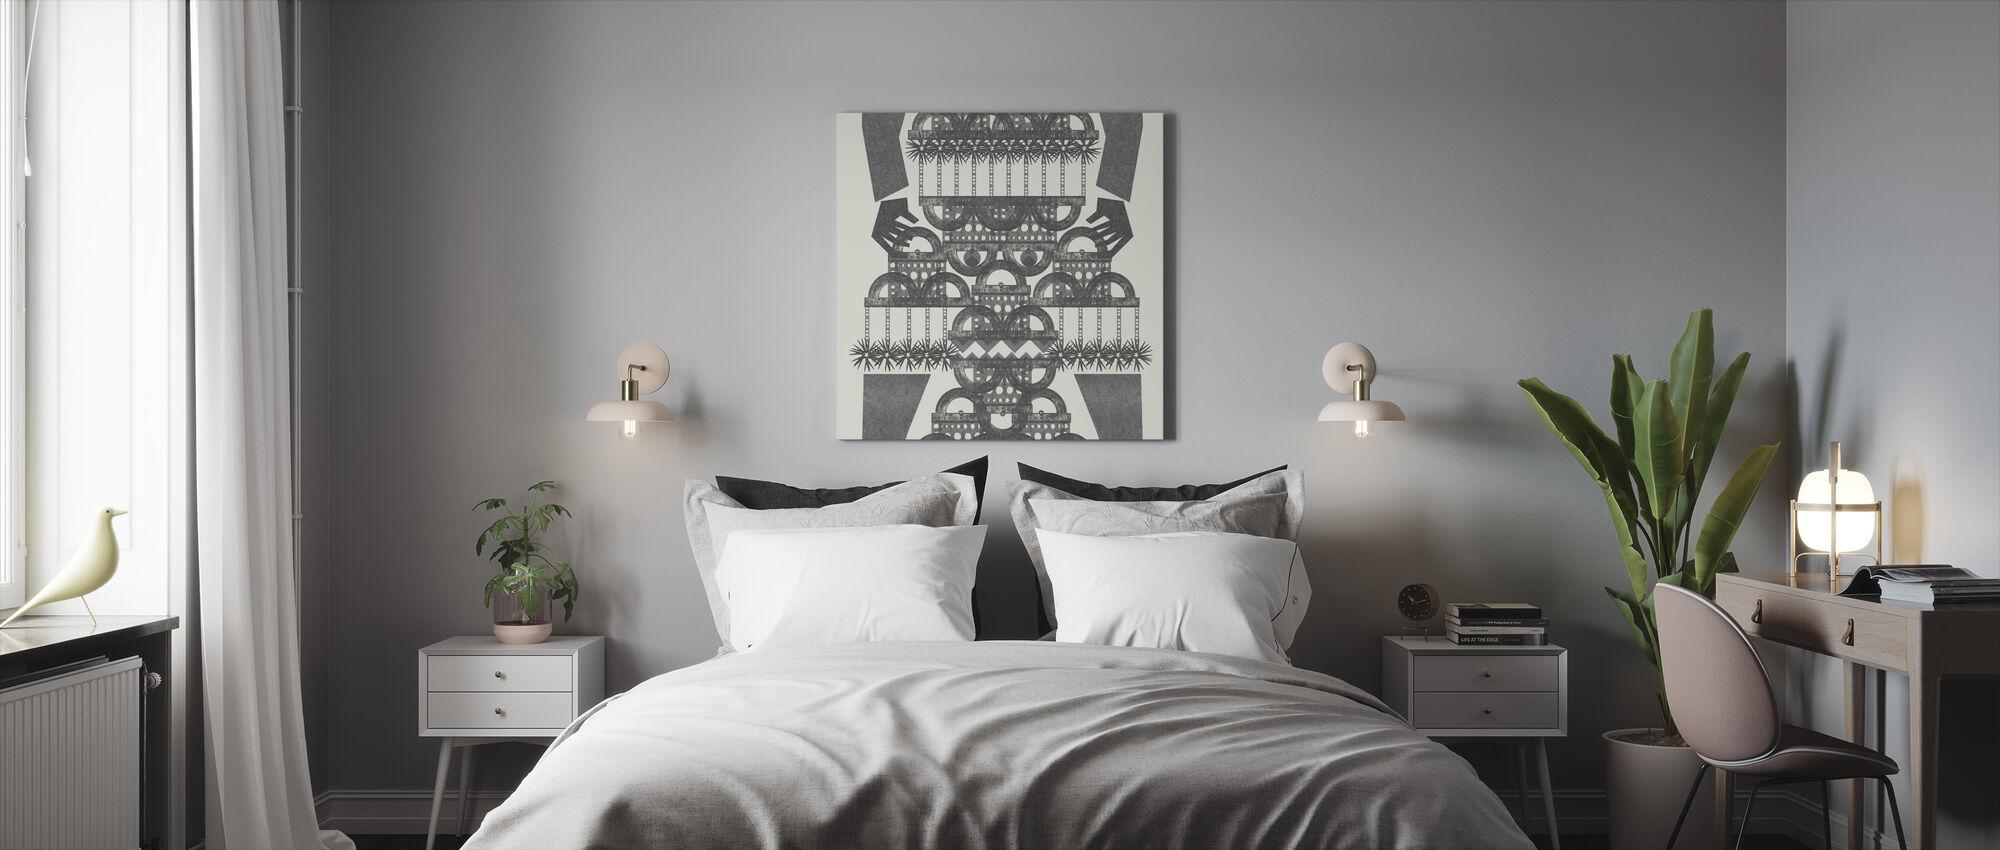 Totem - Canvas print - Slaapkamer